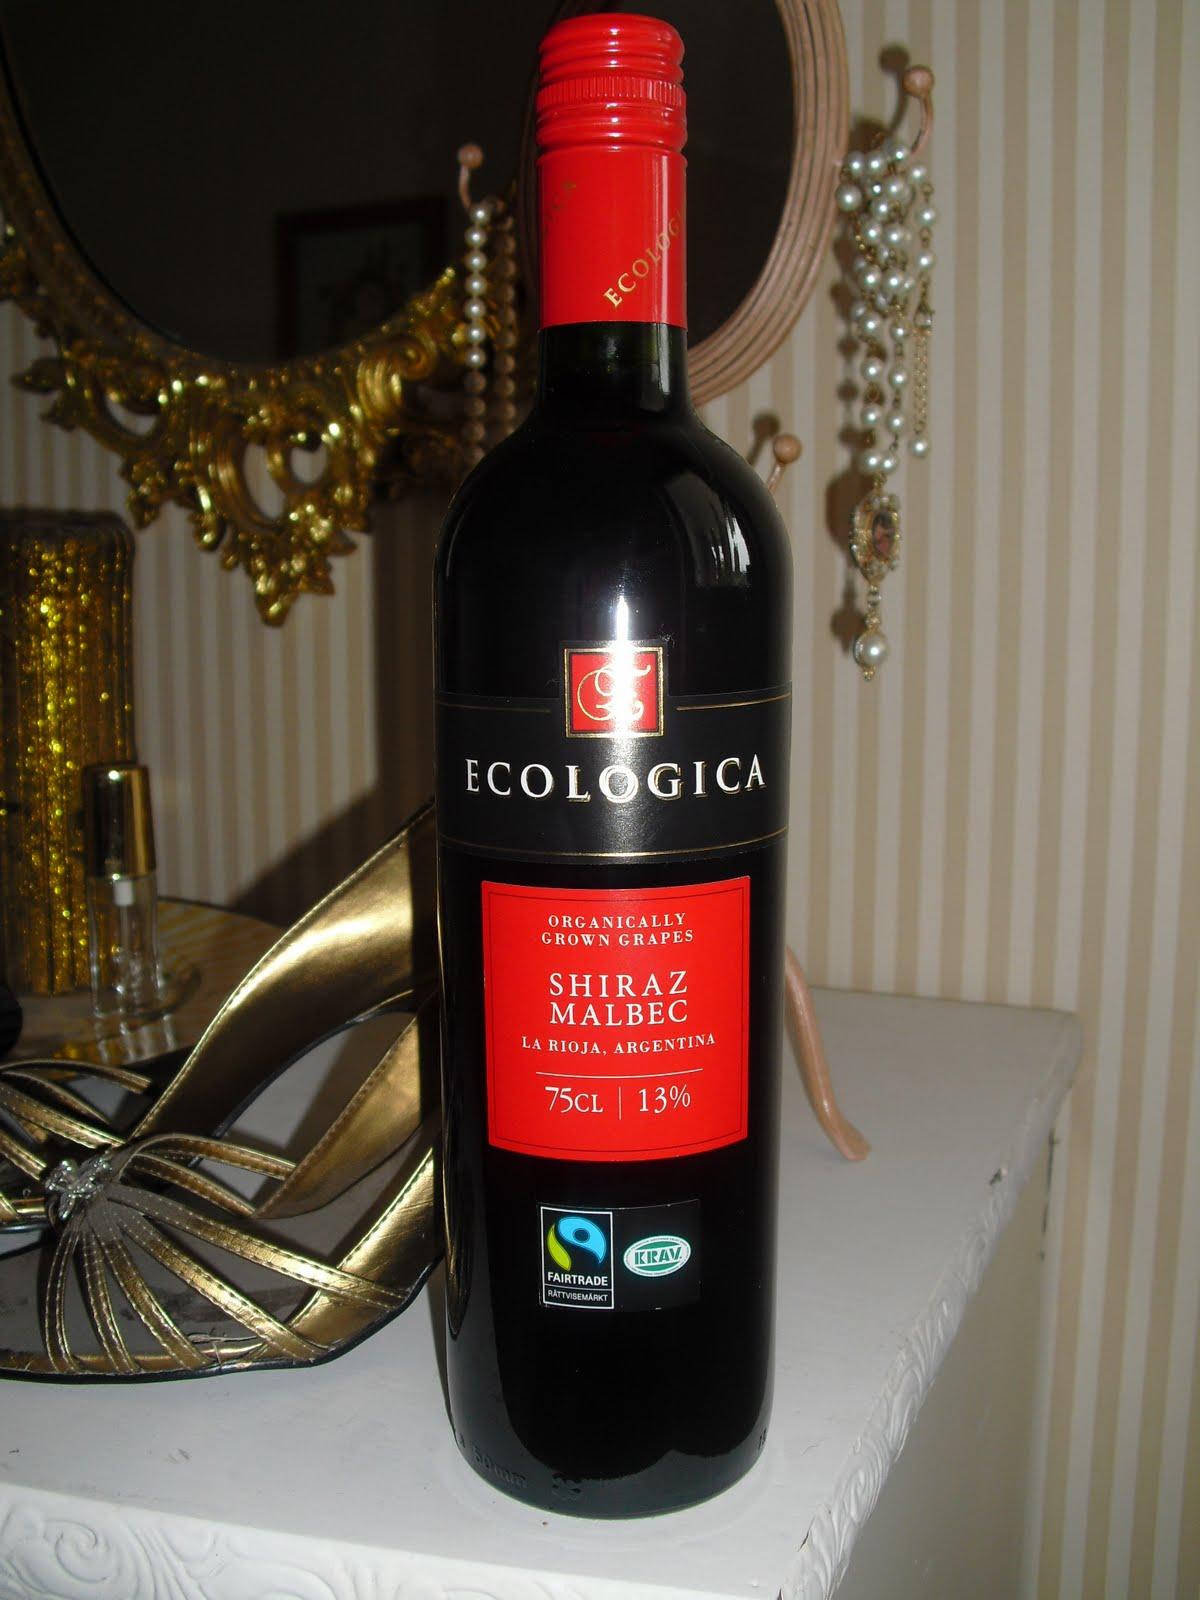 en kjent vin